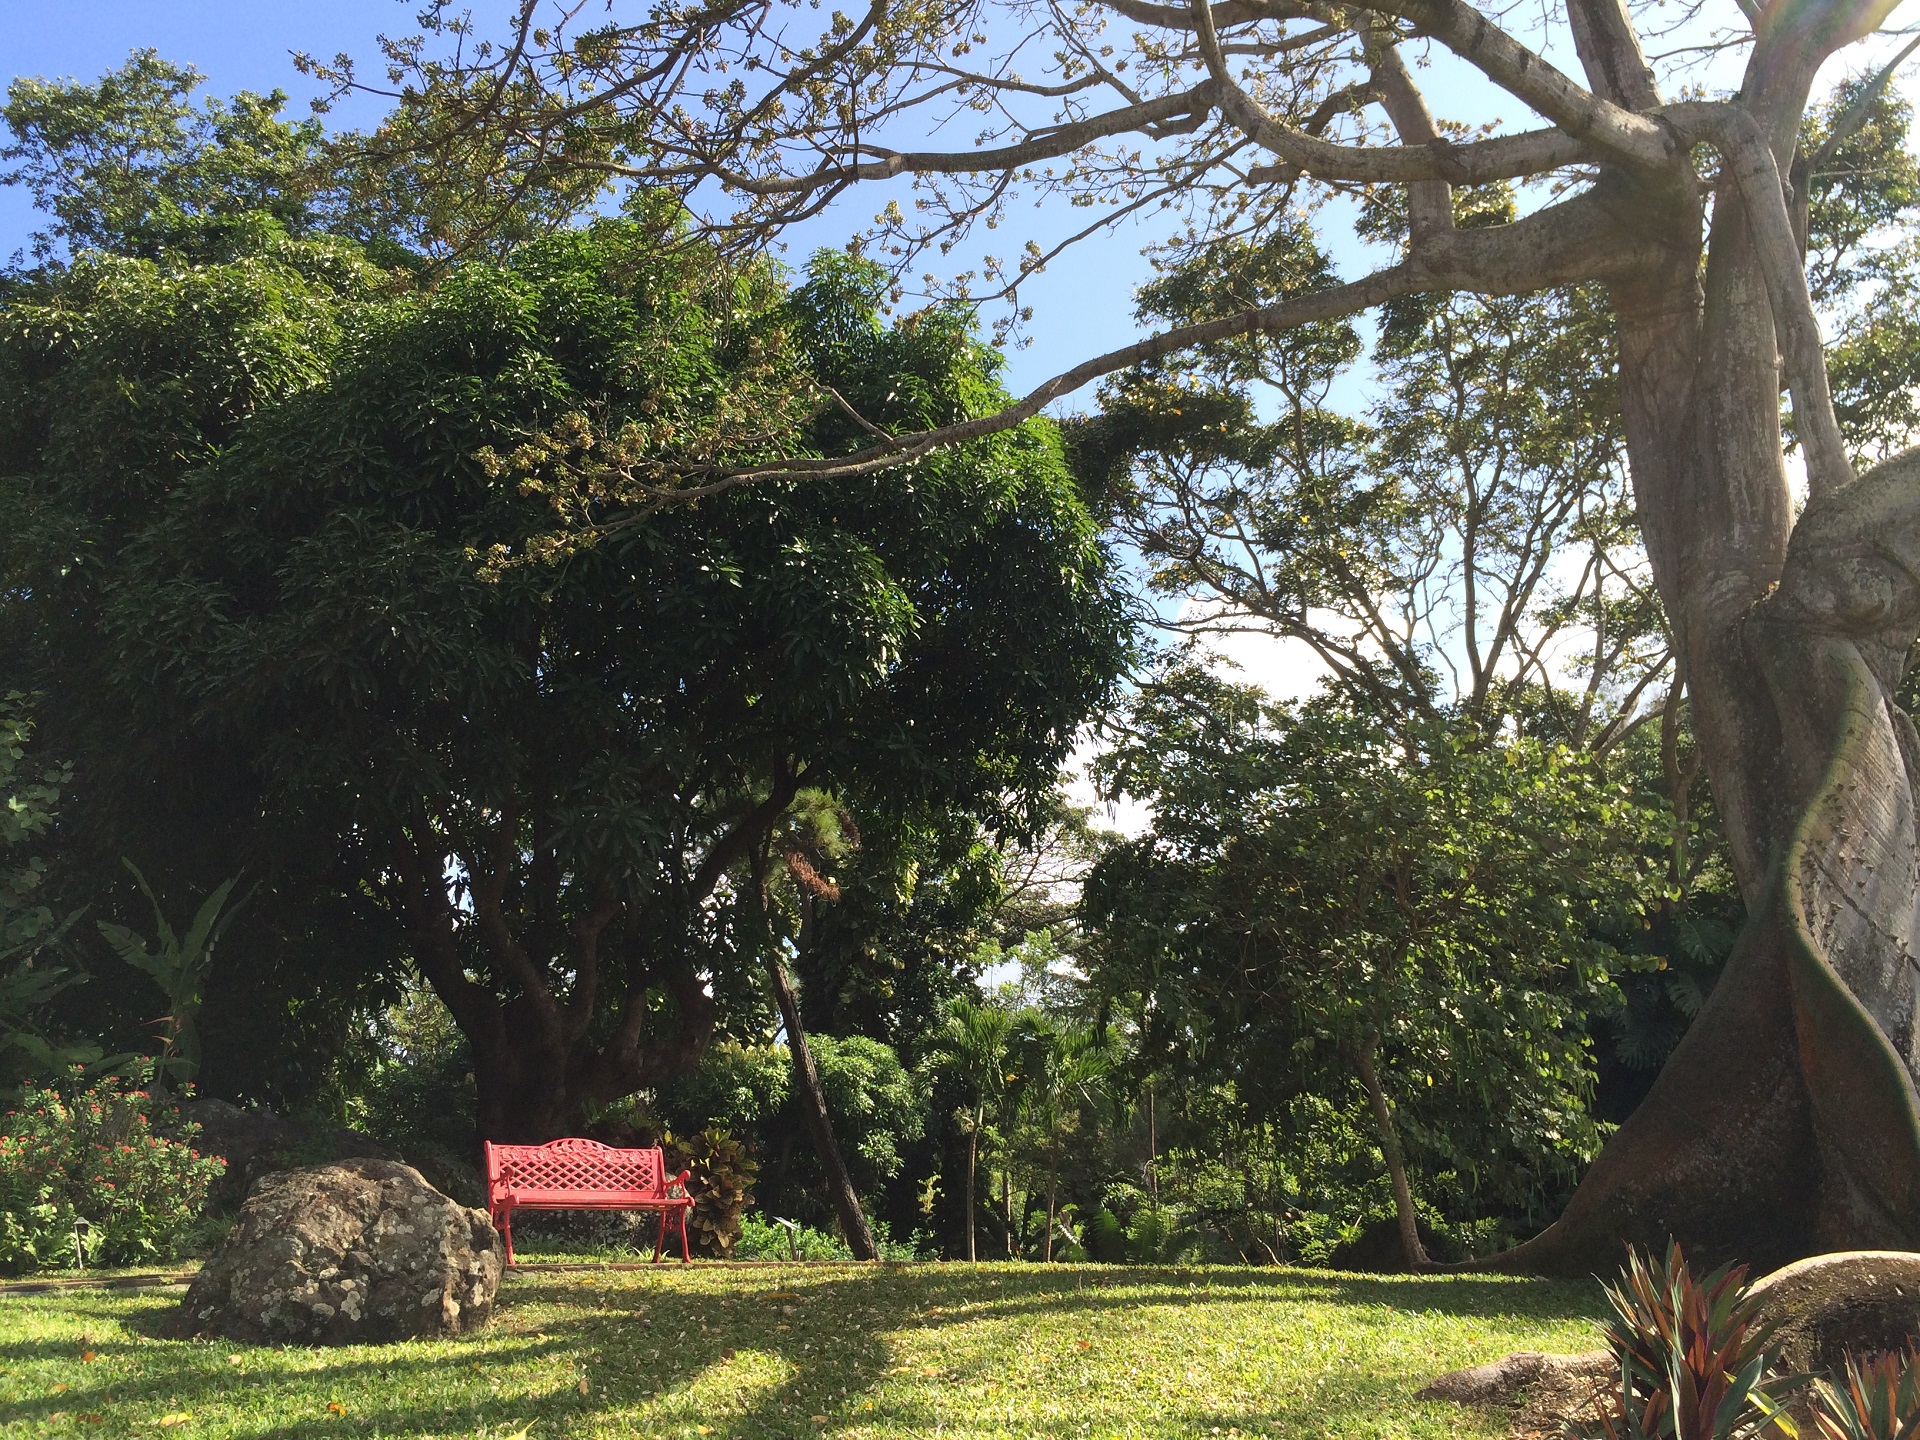 A voir karukera sunset ex maryjacktropic location de for Jardin botanique ouverture 2015